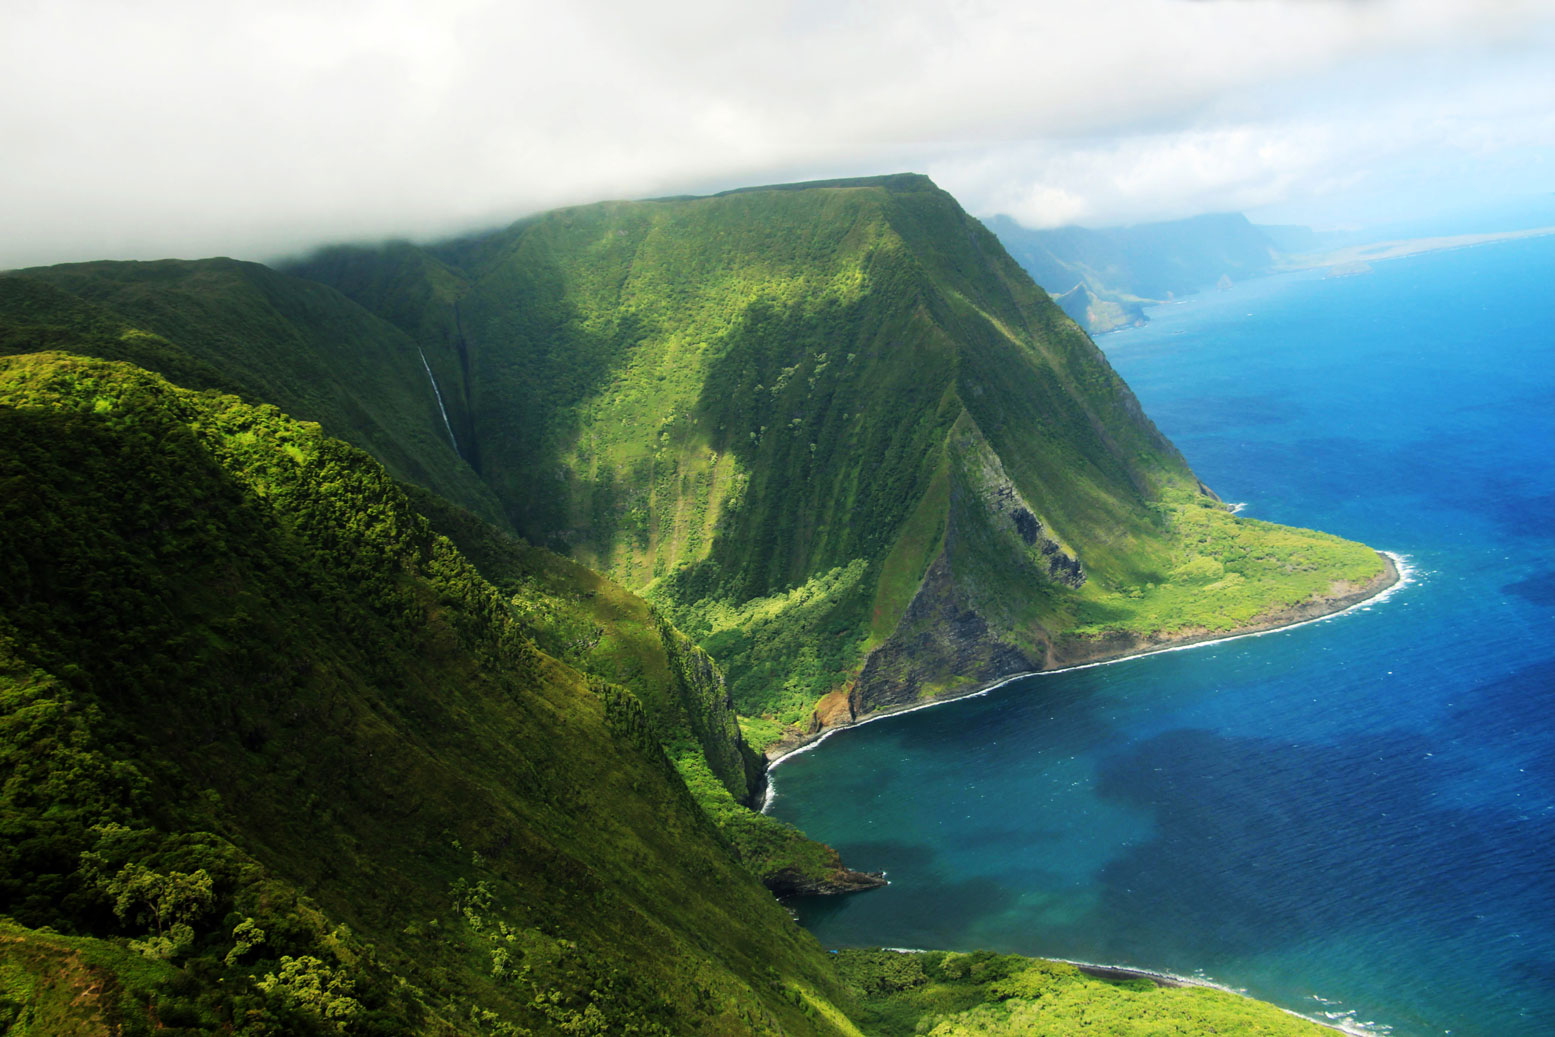 Areal view of Molokai island